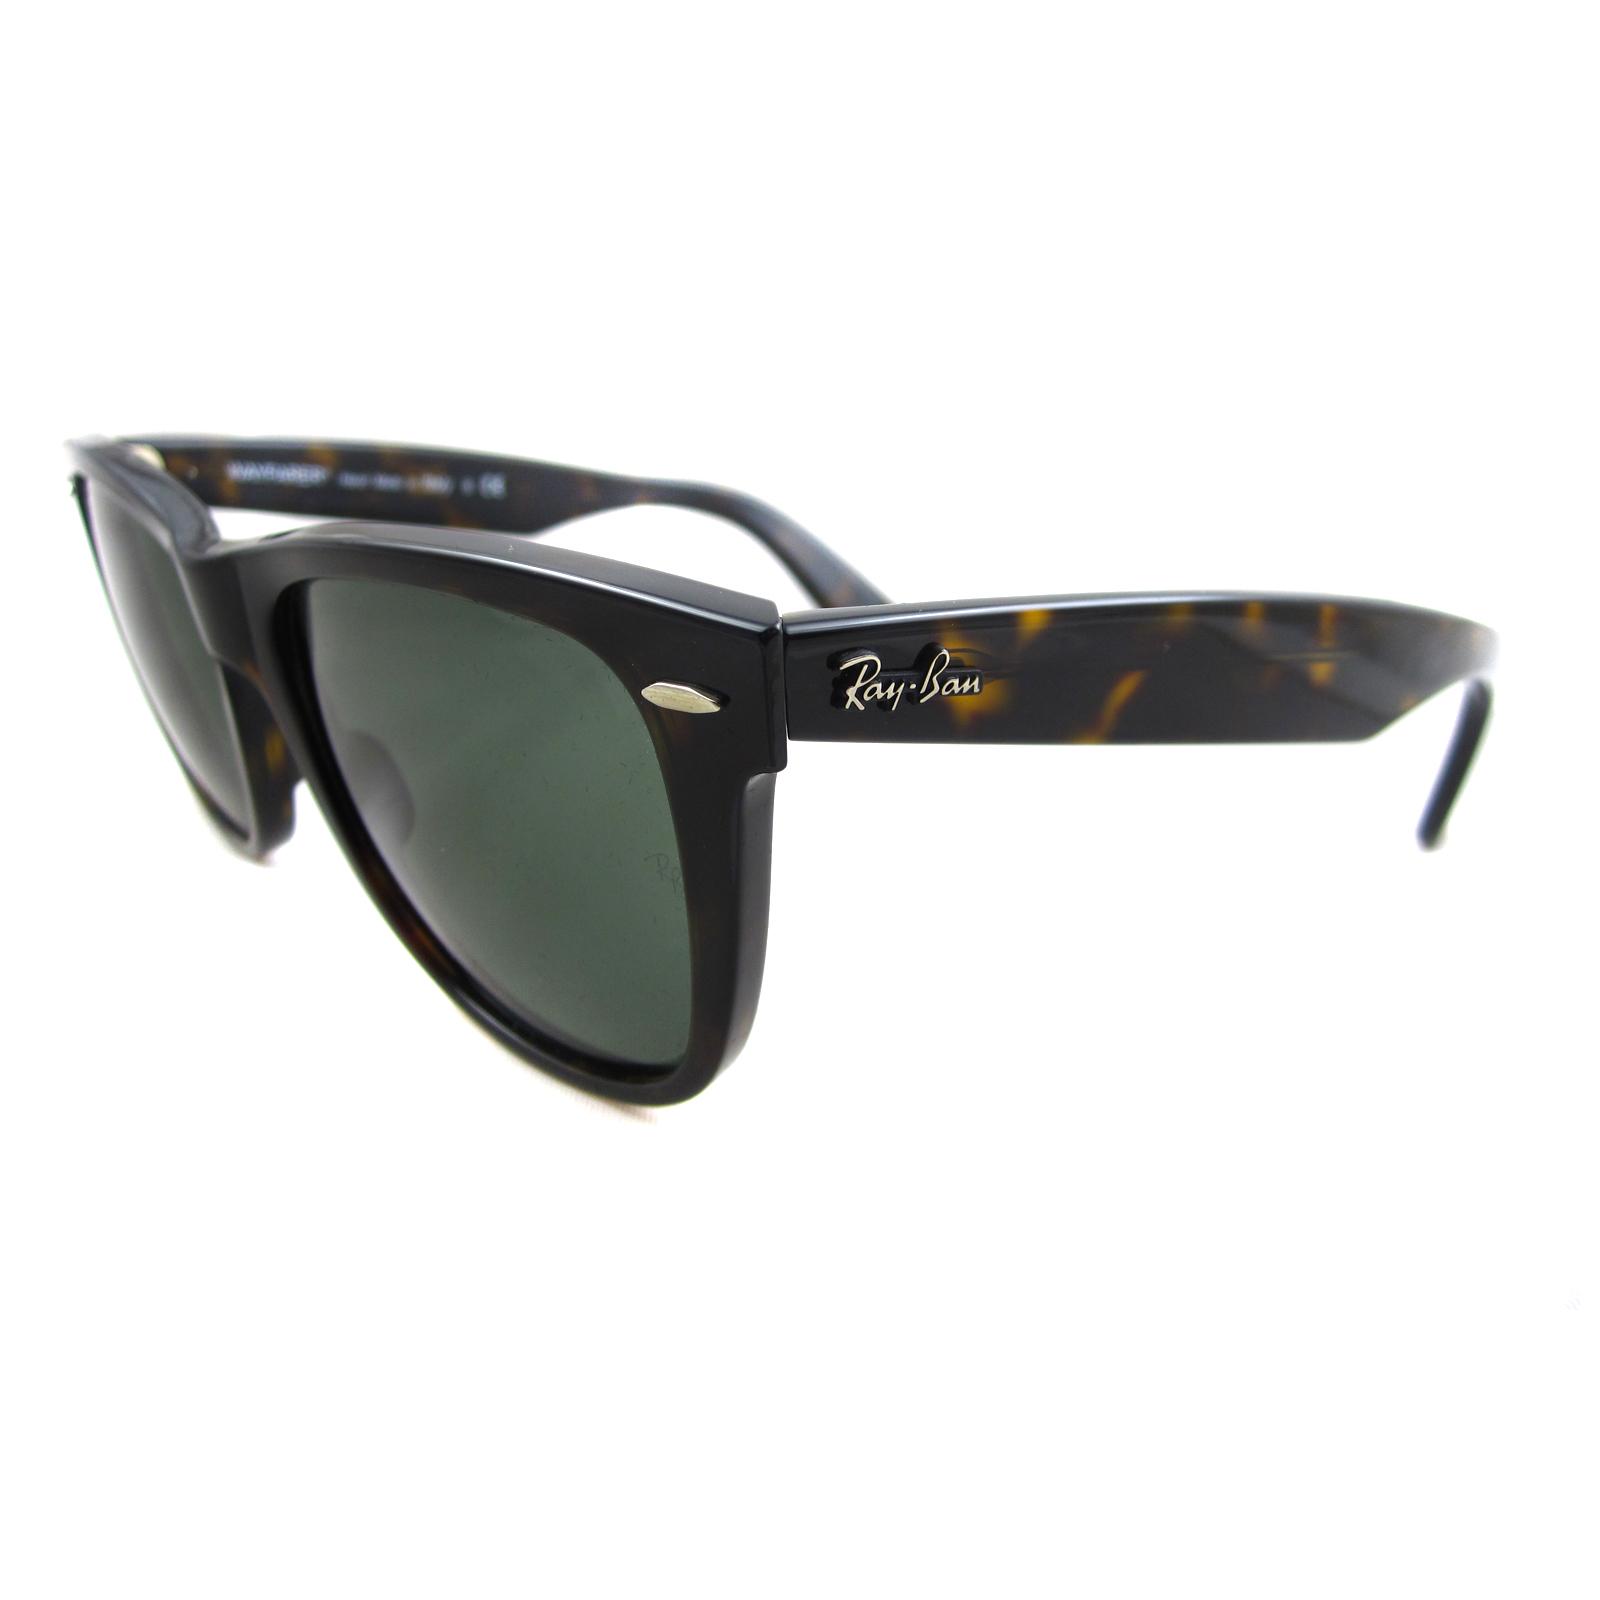 ray ban 902  Ray-Ban Sunglasses Wayfarer 2140 902 Tortoise Green G-15 Large 54mm